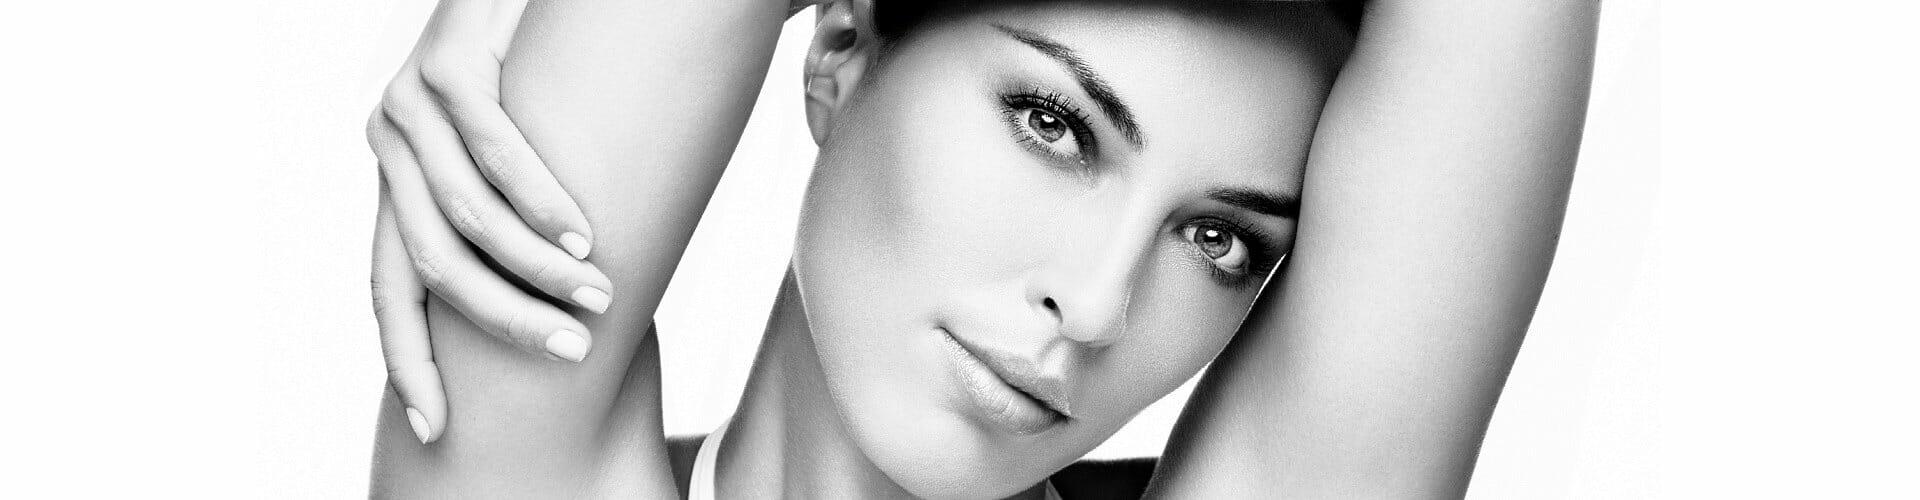 03 Sothys Stunning Woman BellaHelena 2013 - Hinnasto